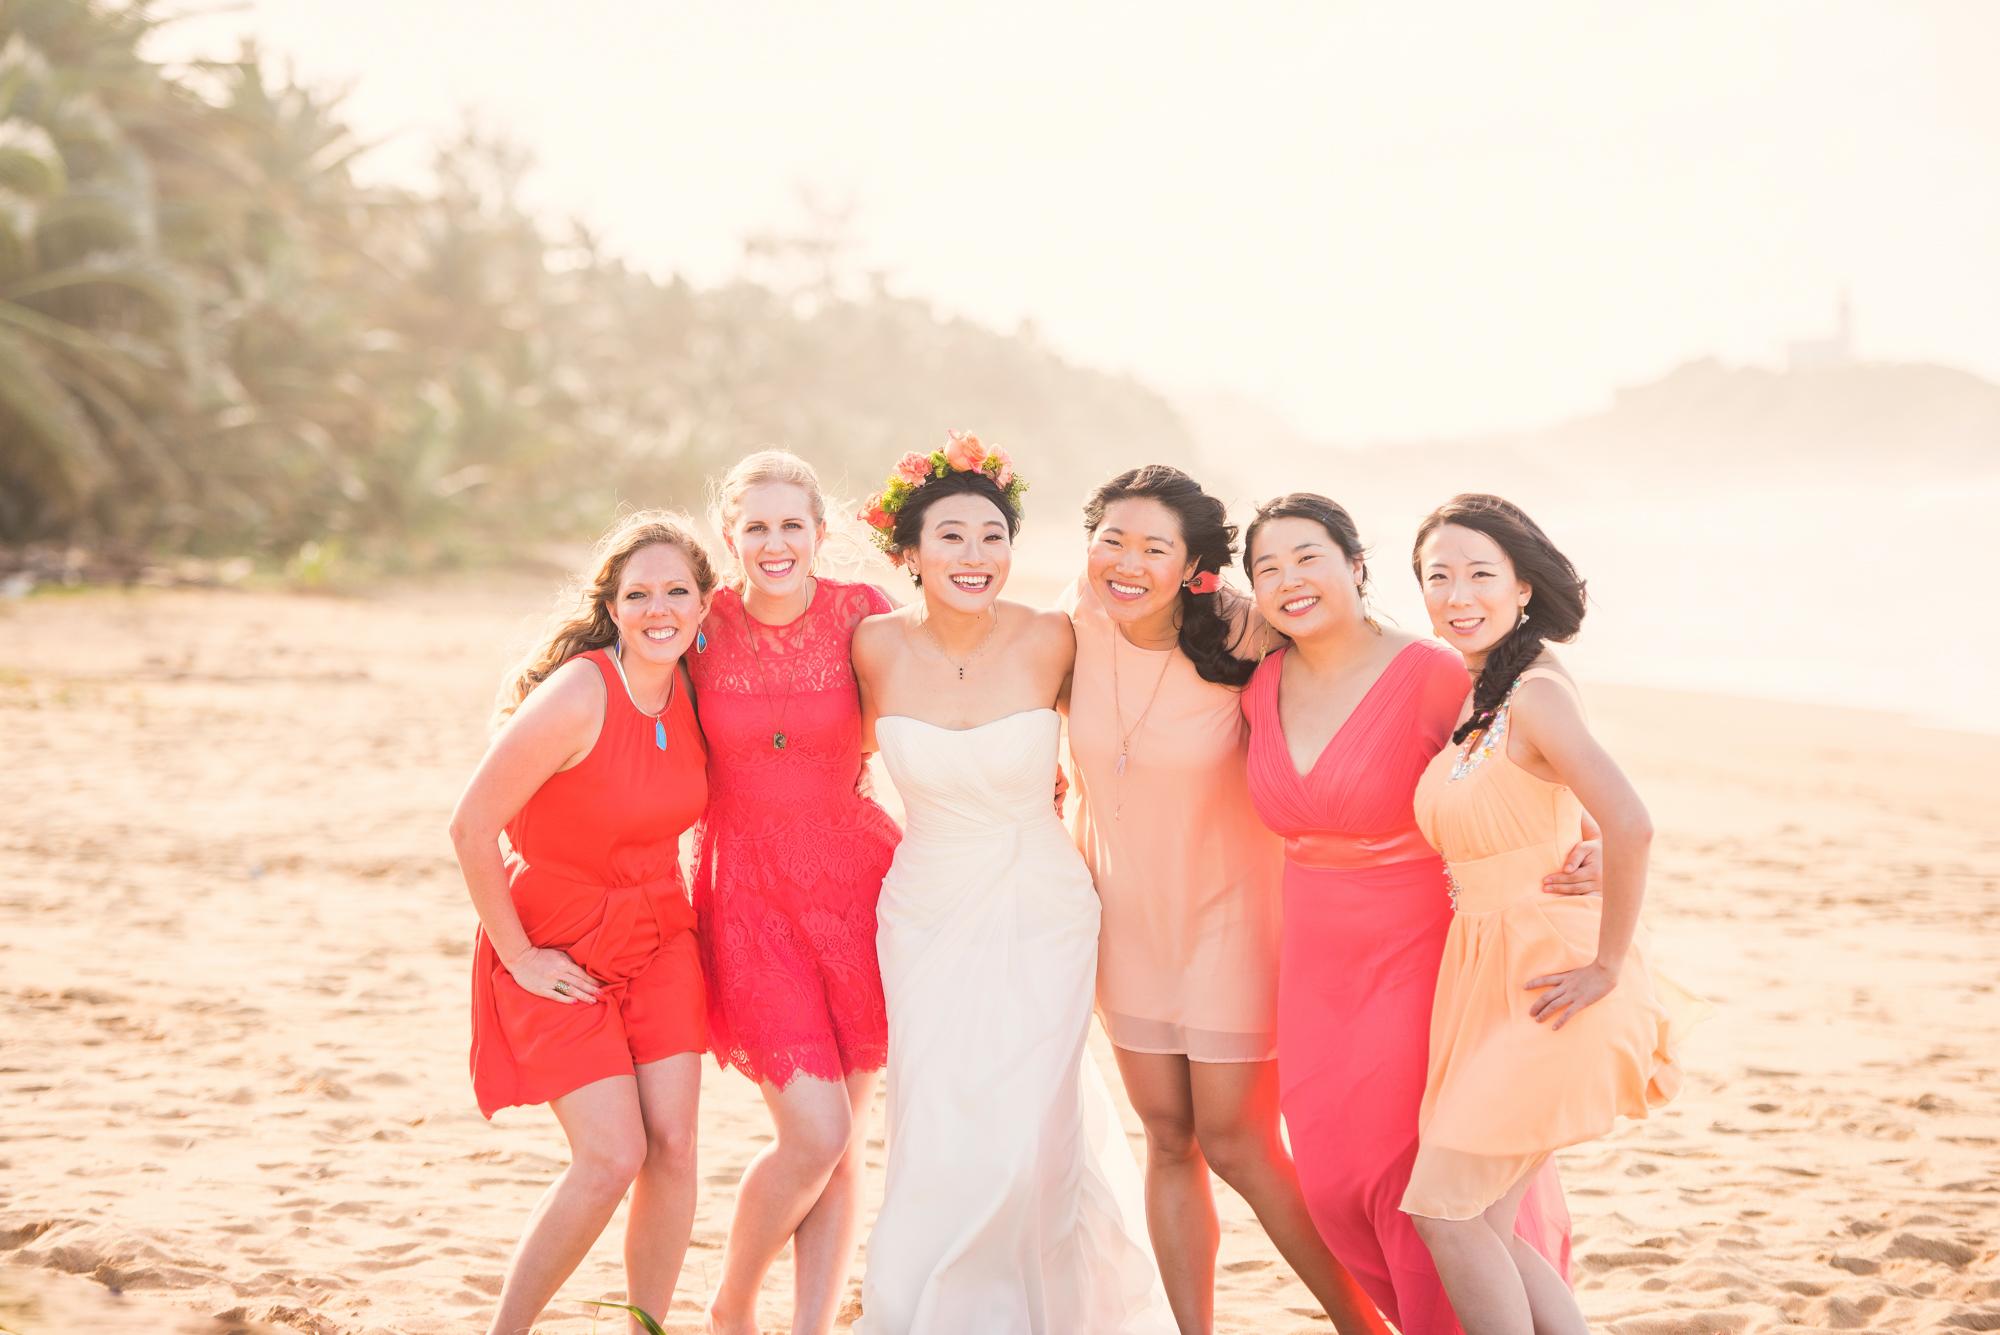 Yifan_Zhang_Geoff_Oberhofer_Carlin_Ma_wedding--9.jpg